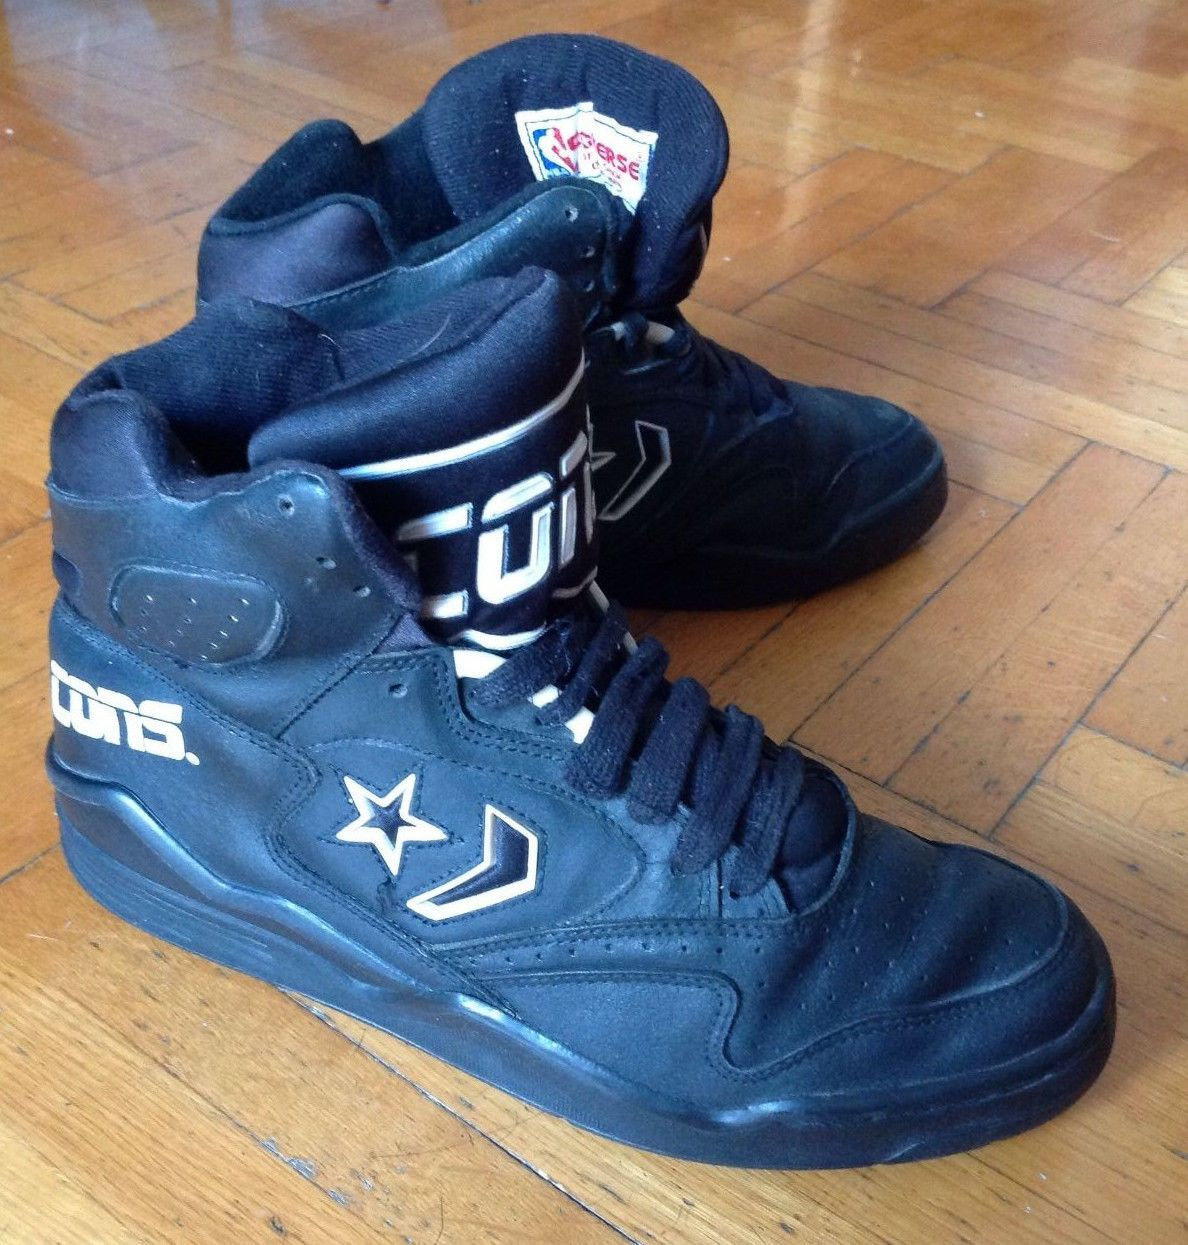 Converse Cons Erx Hi Top Size 9 1 2 Us Black 90 S Vintage Basketball Nba Converse Basketball Shoes Sneakers Converse